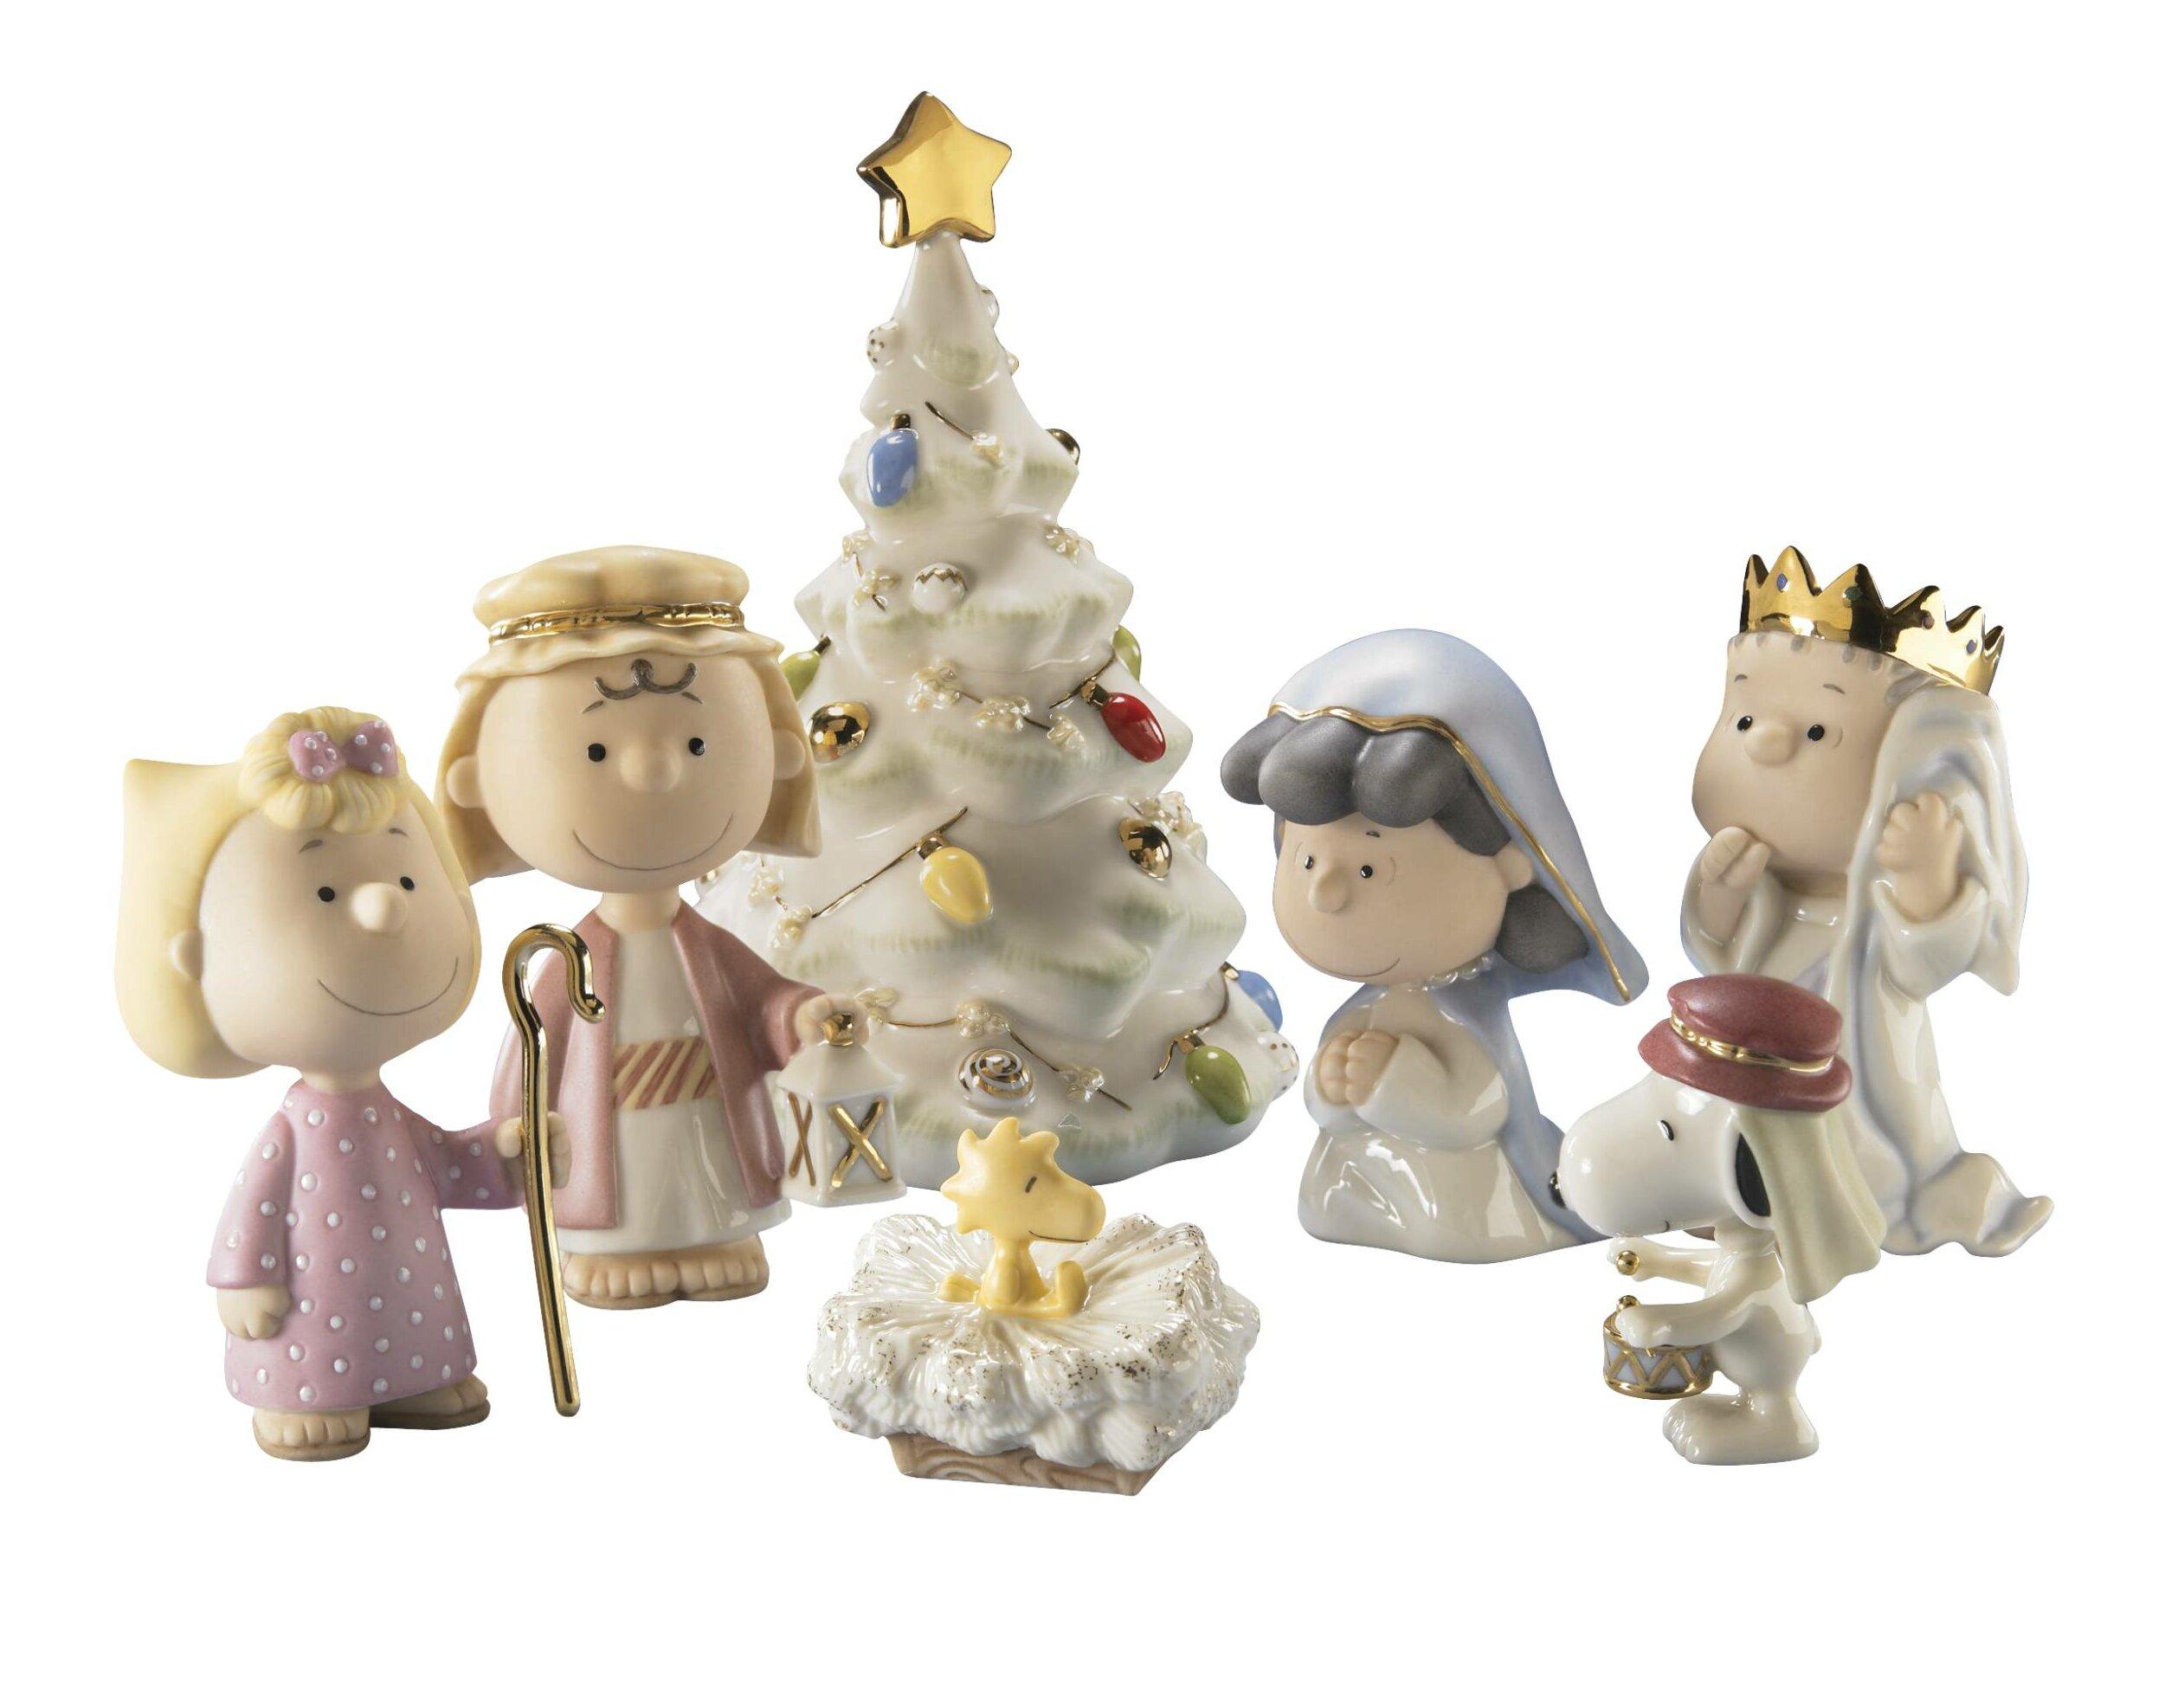 Peanuts Figures Christmas 2020 Set Lenox Peanuts the Christmas Pageant Figurine Set by Lenox